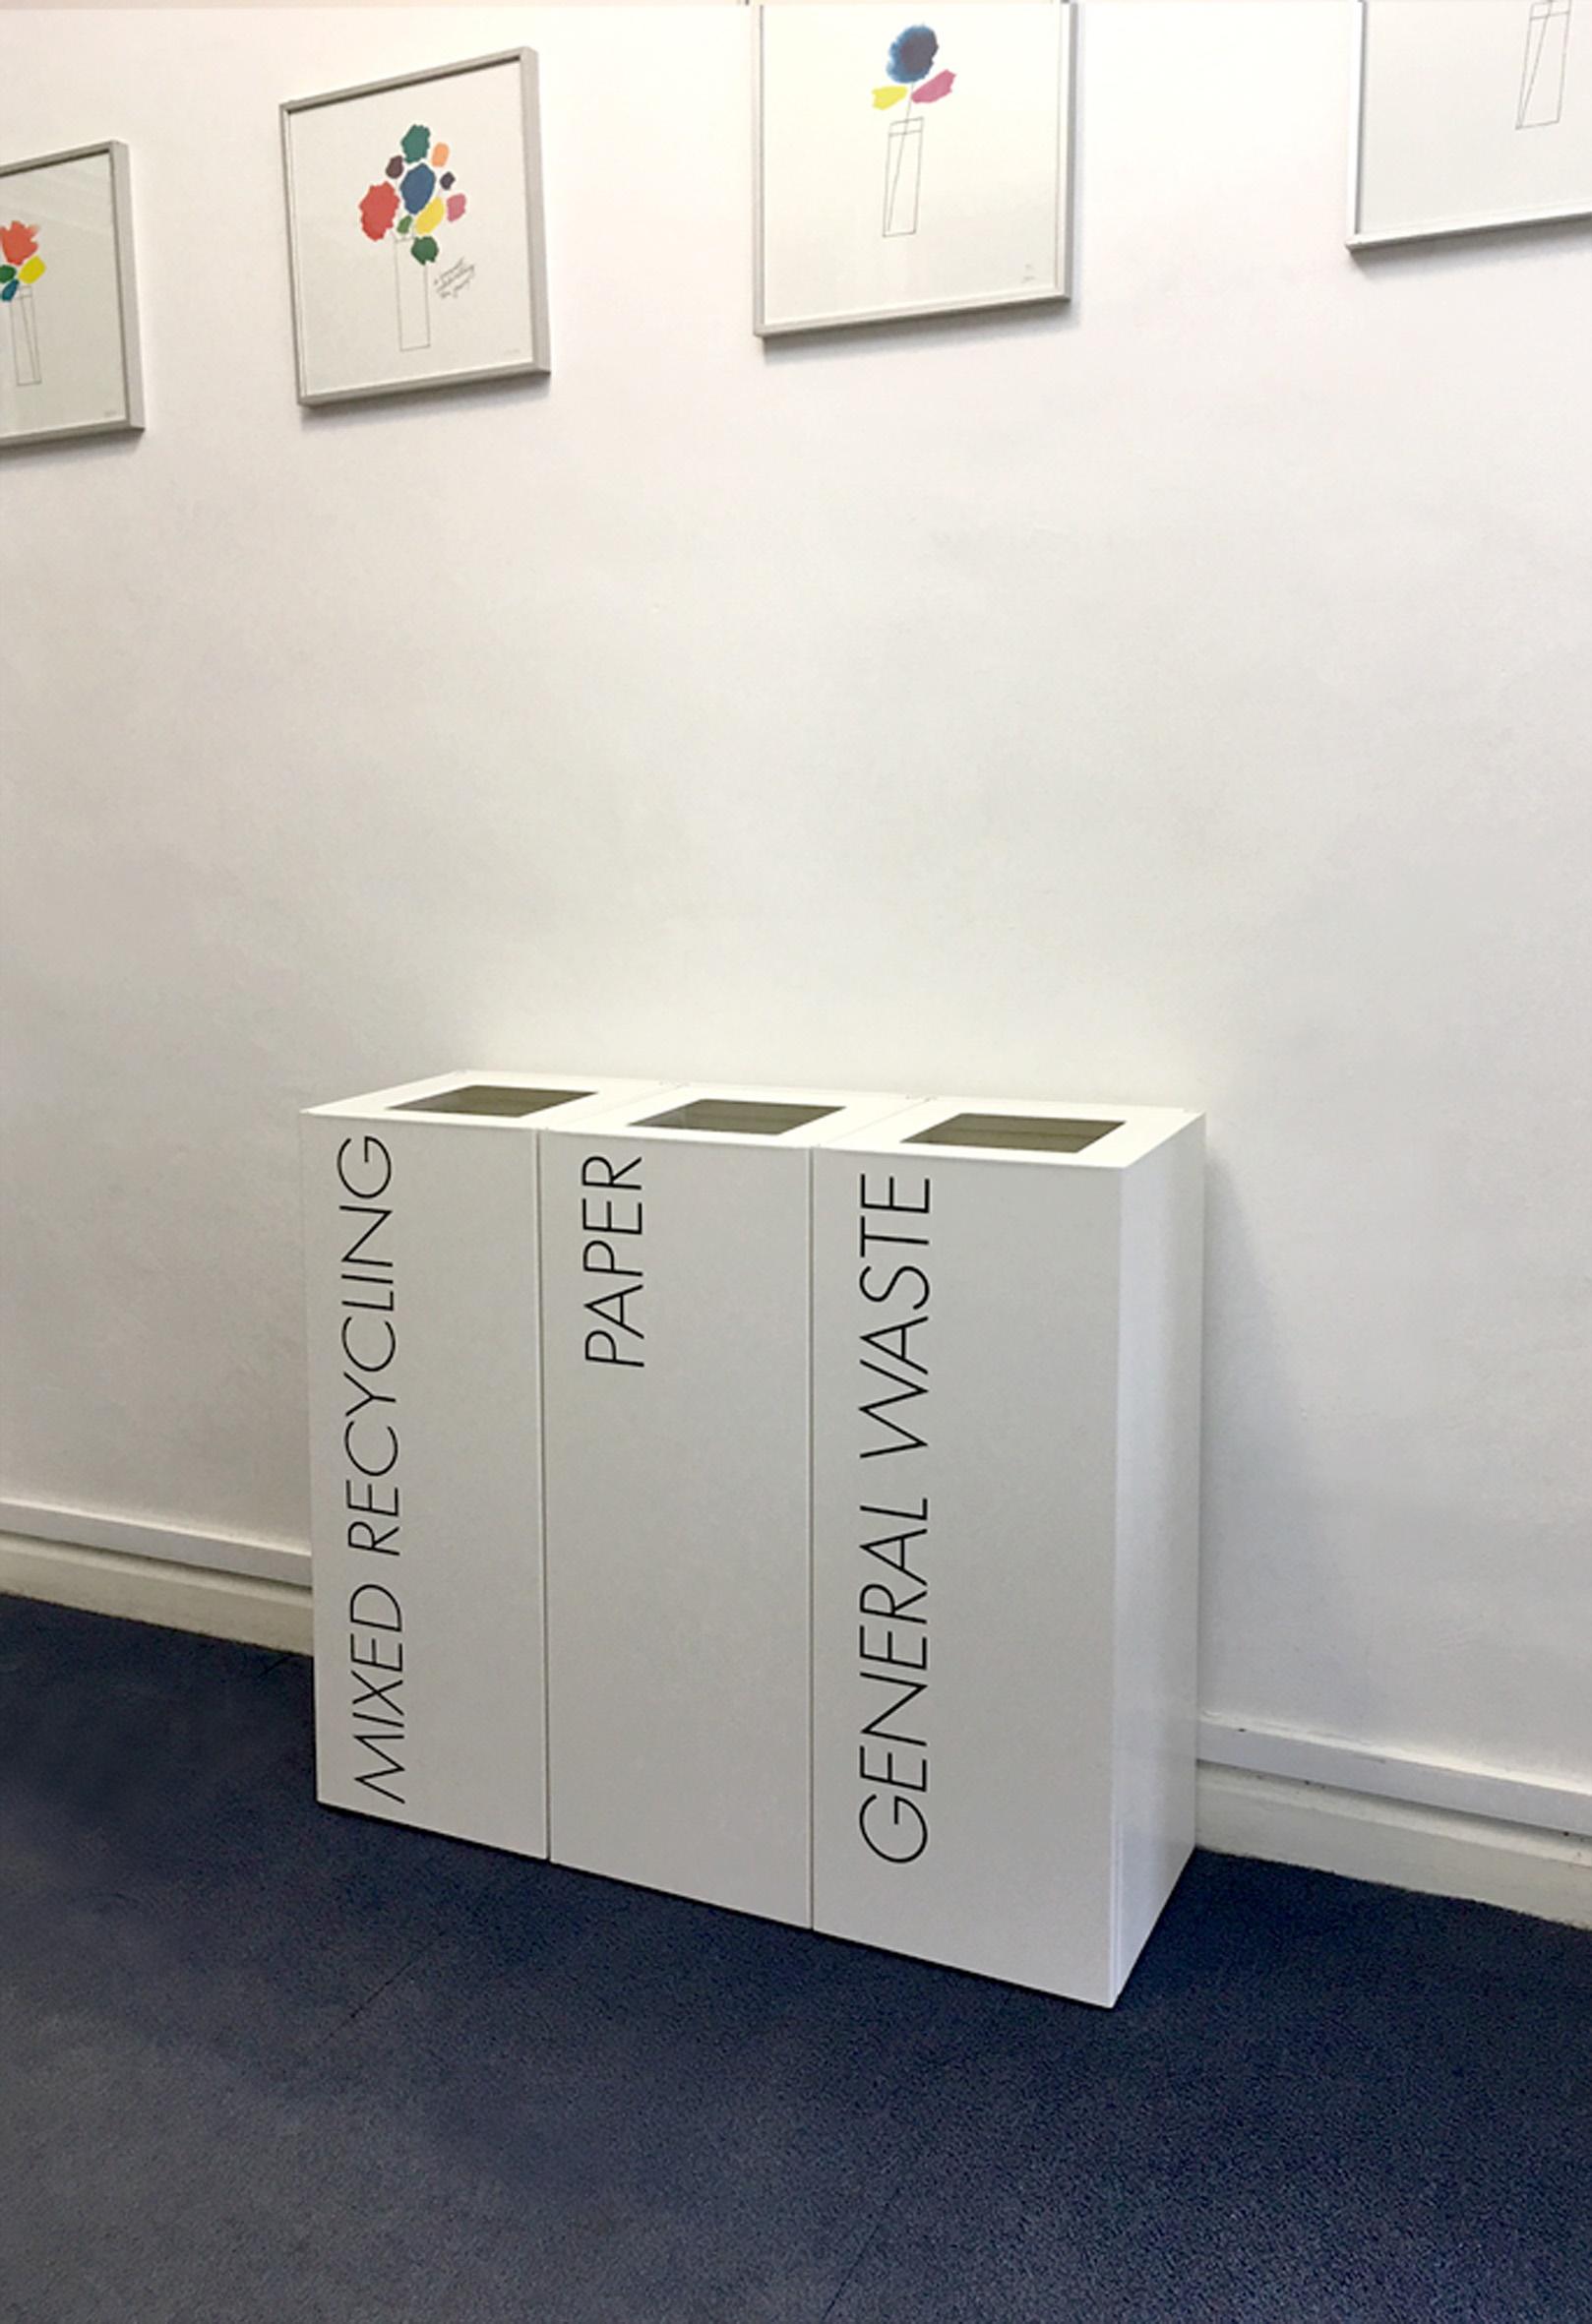 Office Recycling Bins Stylish Office Recycling Bins